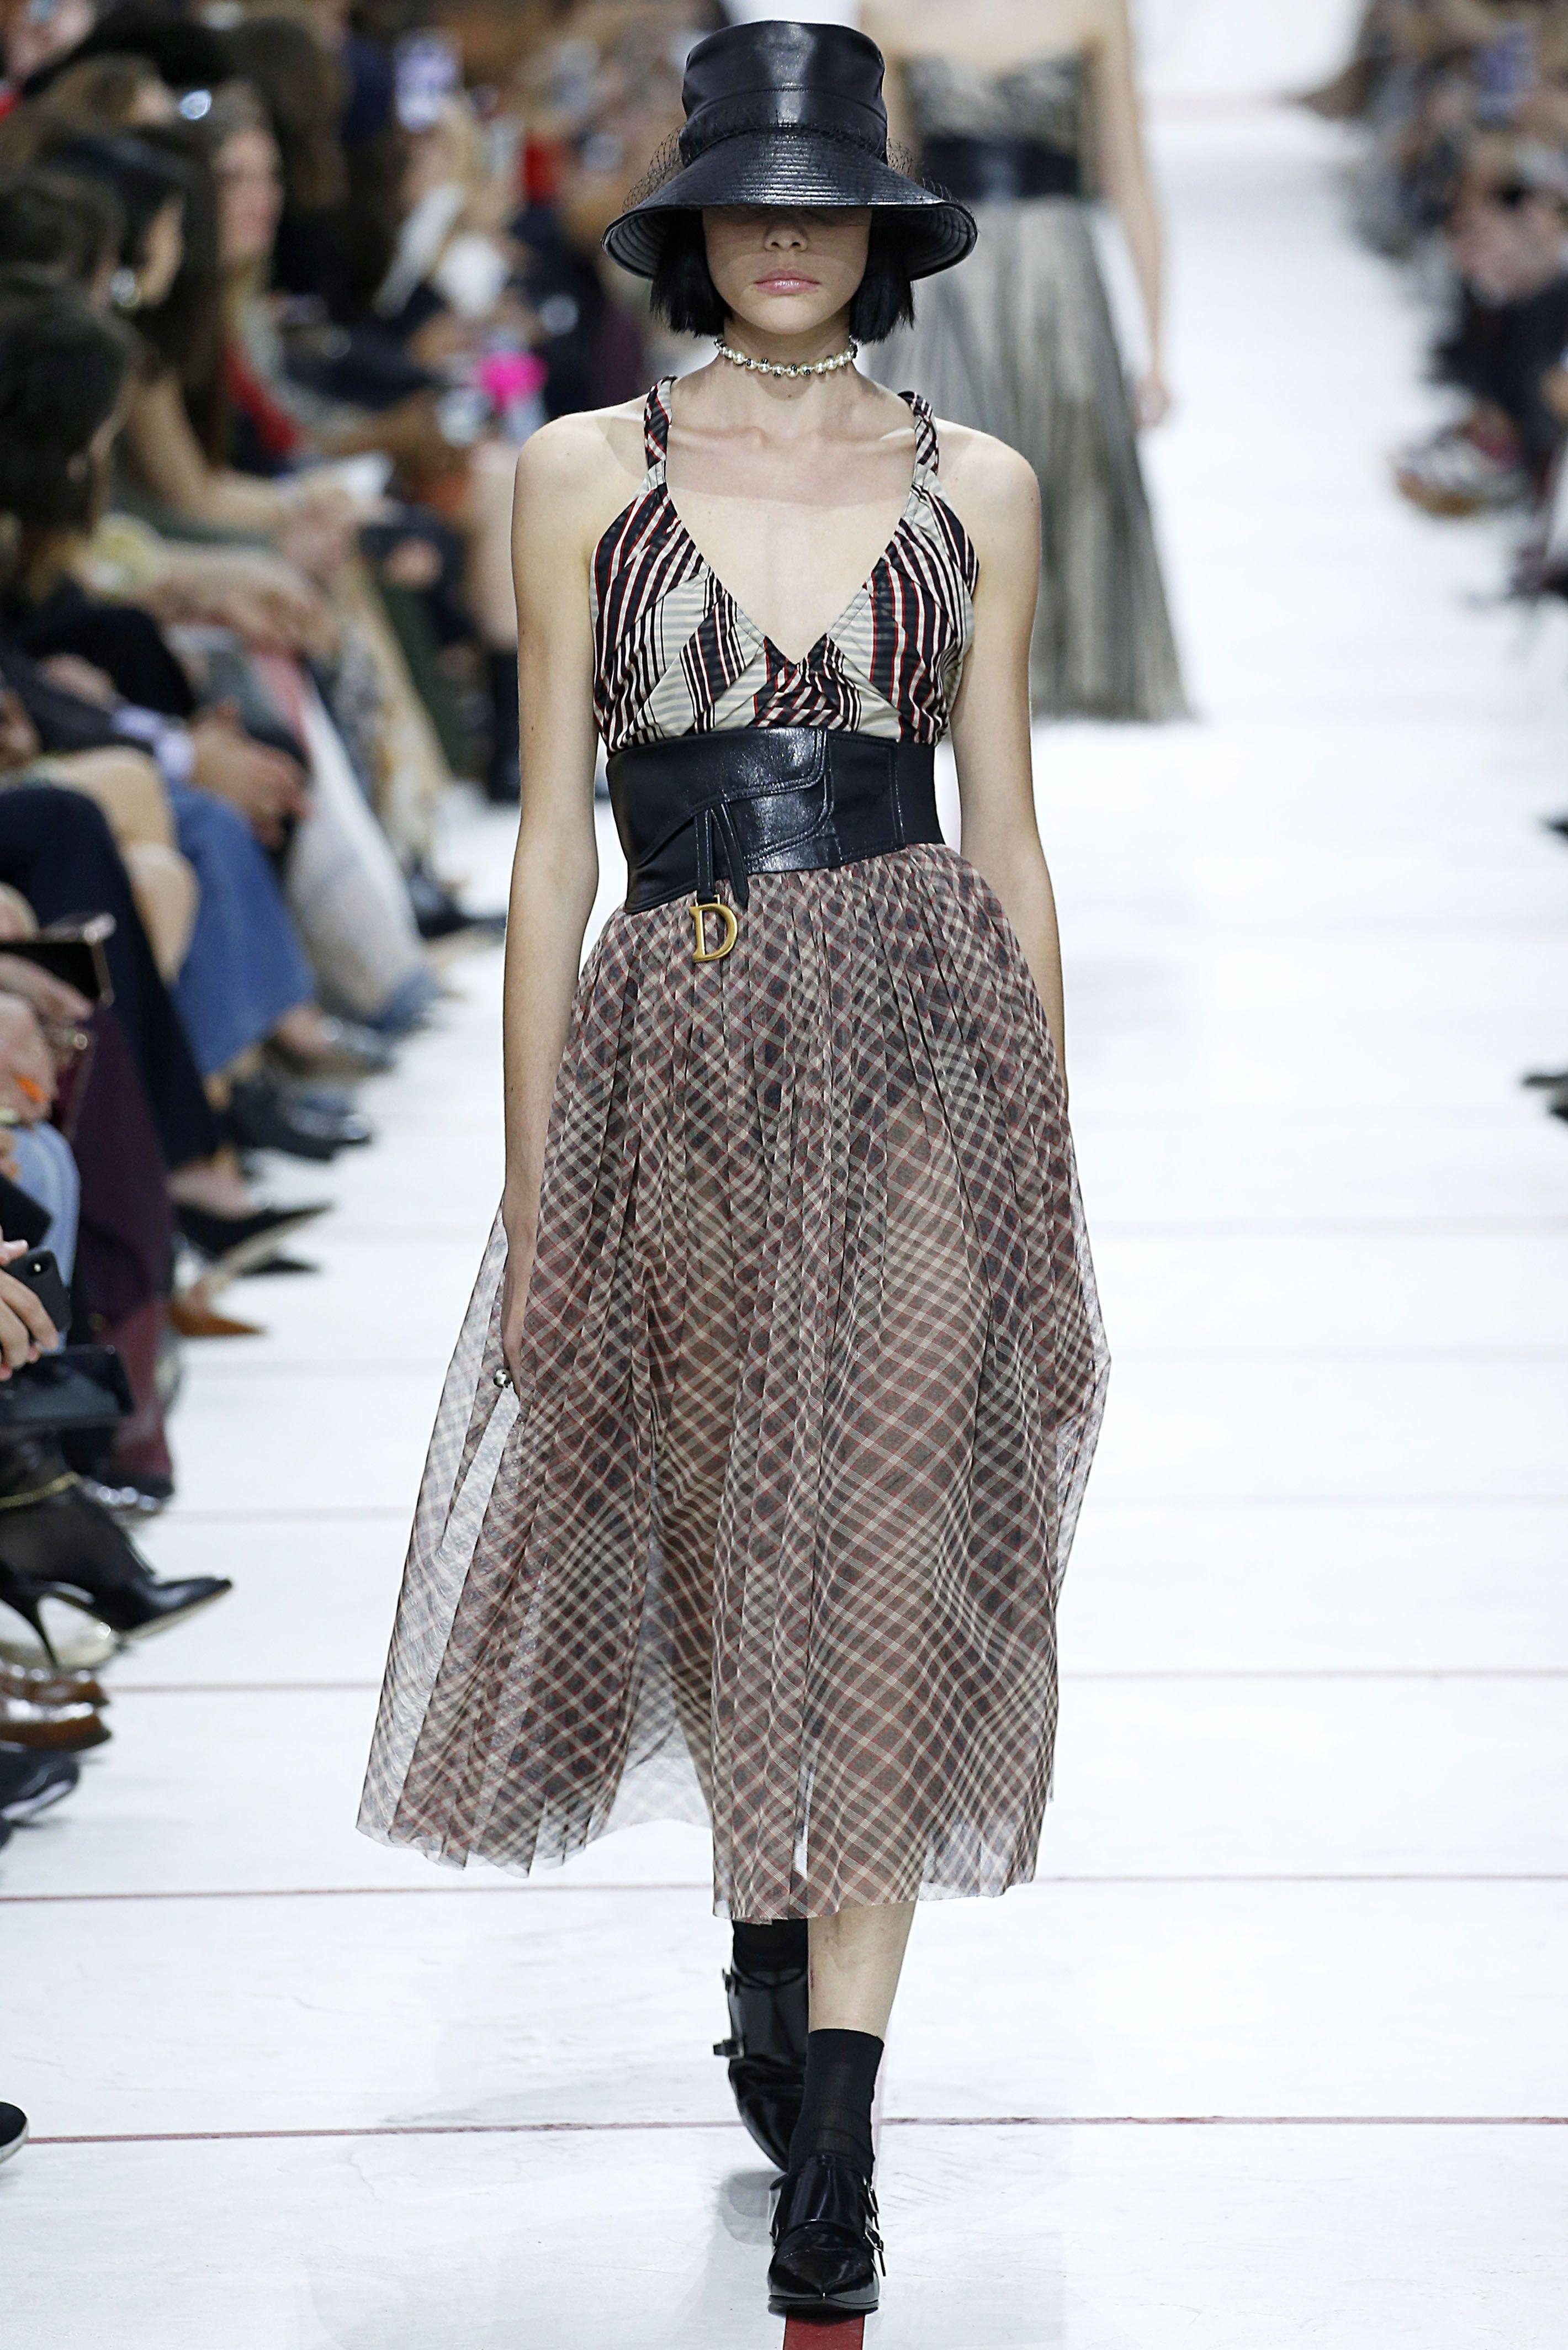 Paris Fashion Week Christian Dior Fall 2019 Review-Dior Bucket Hats ddf4a0ab198b